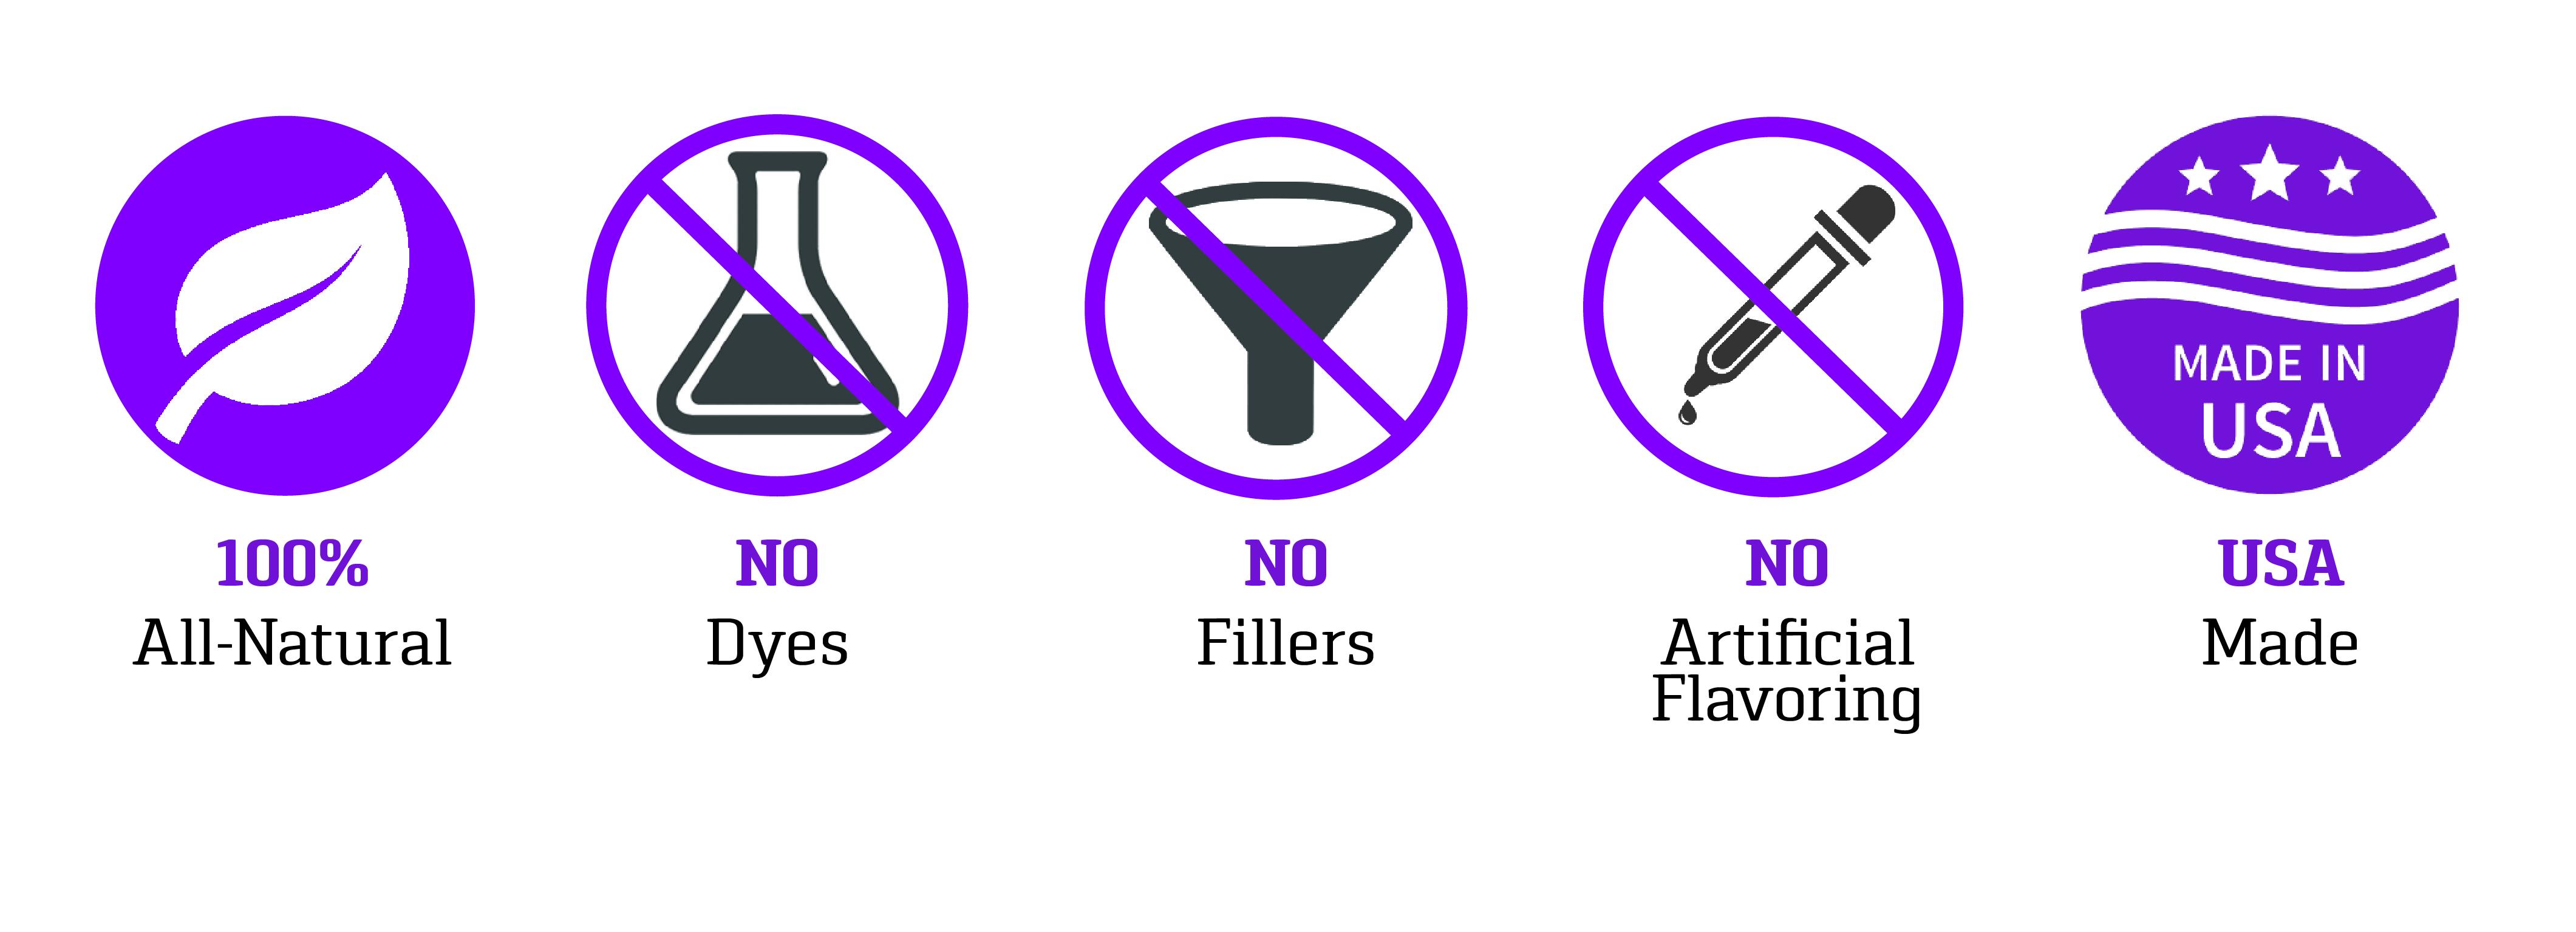 no-additives-graphic-10-21-18-01.jpg